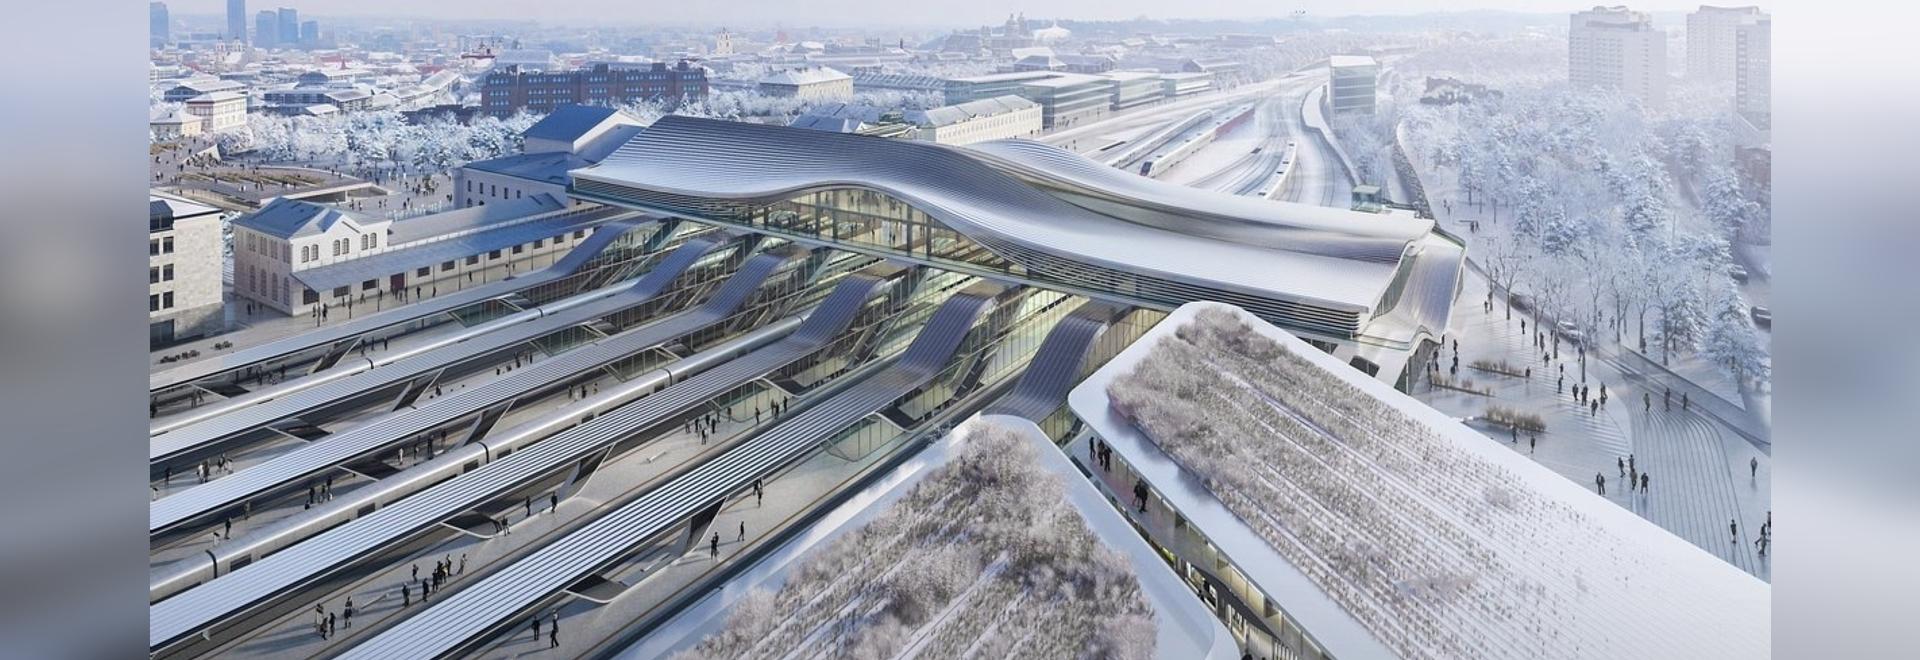 Zaha Hadid Architects designs sweeping bridge across Vilnius railway station